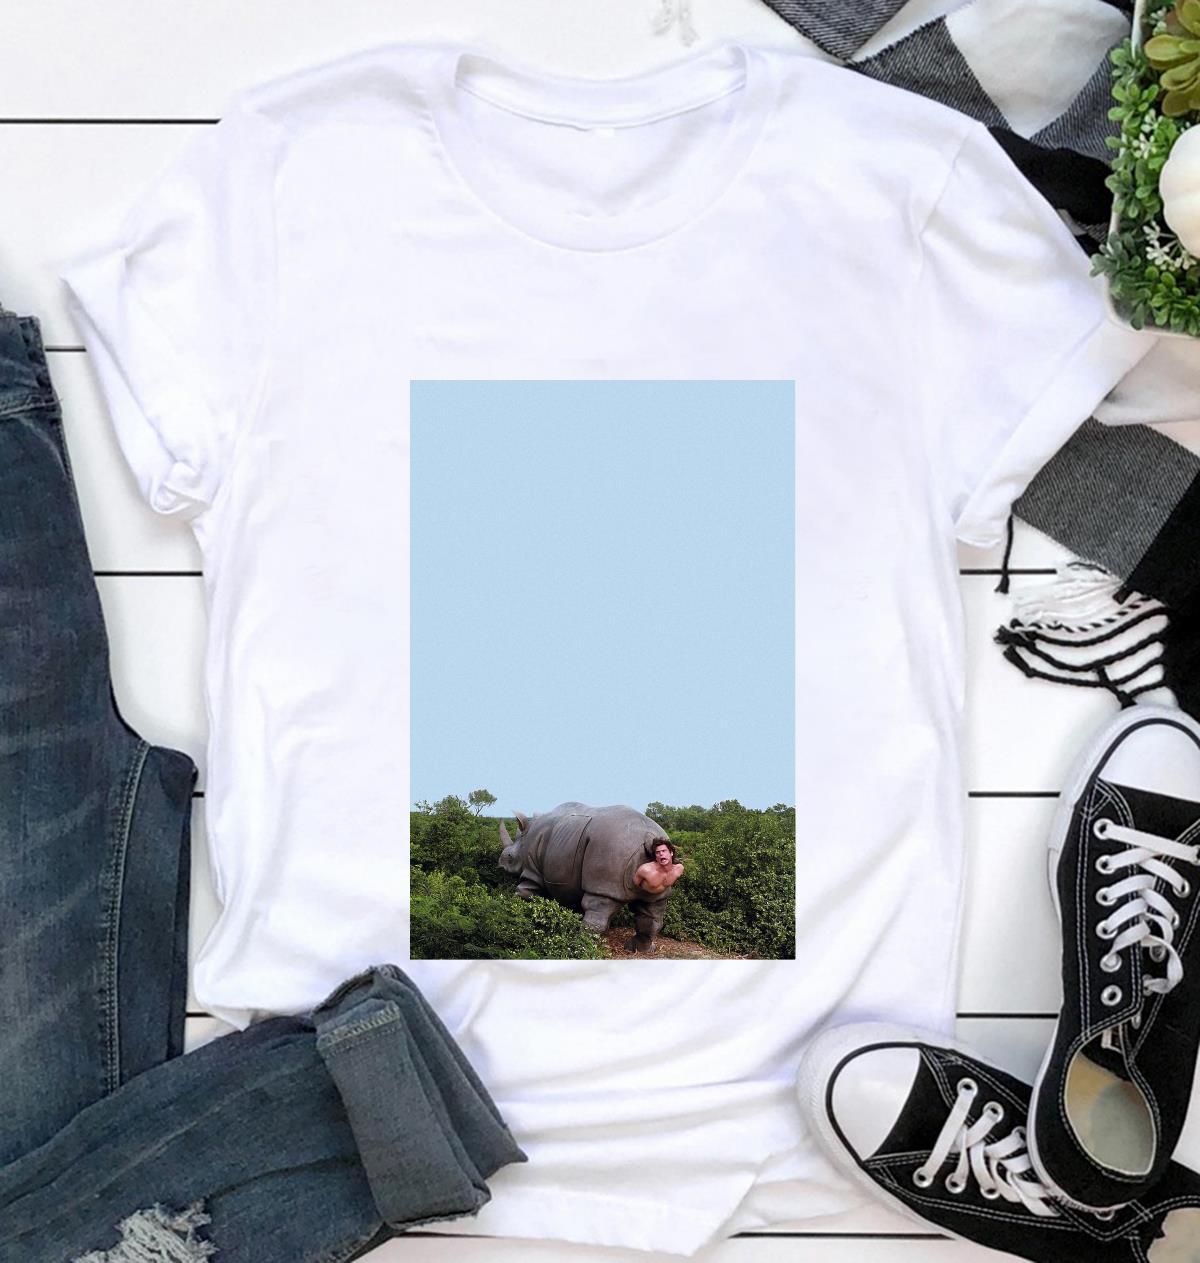 Ace Ventura Rhino pet detective poster t-shirt